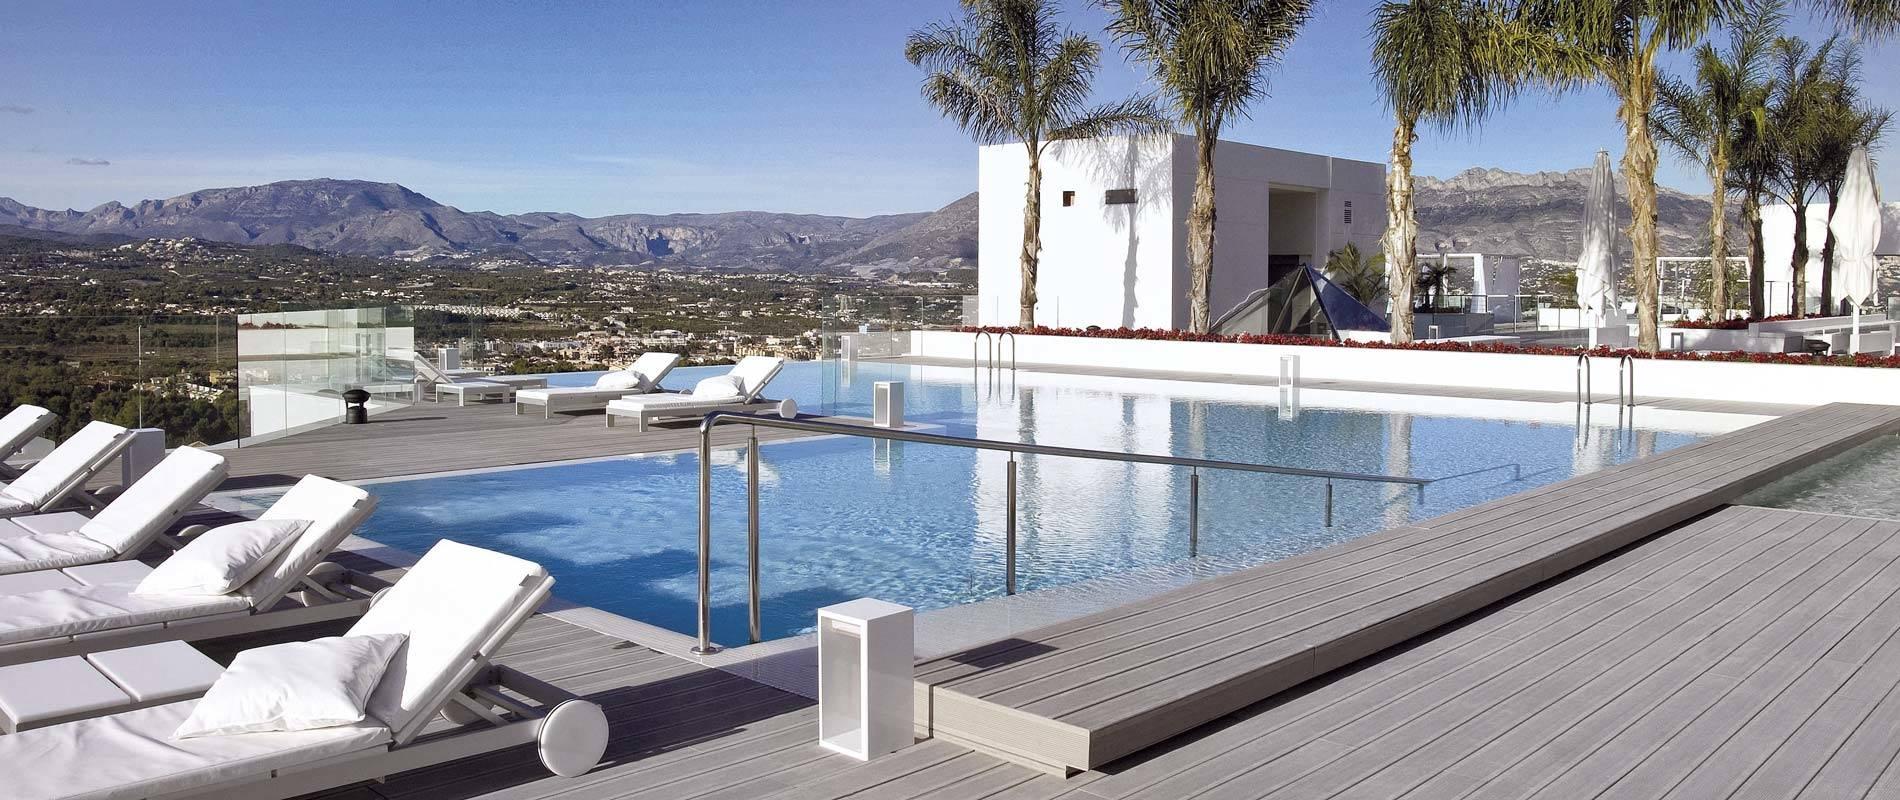 ESPAGNE Terrasse piscine de l hotel Sha Wellness Clinic Alic